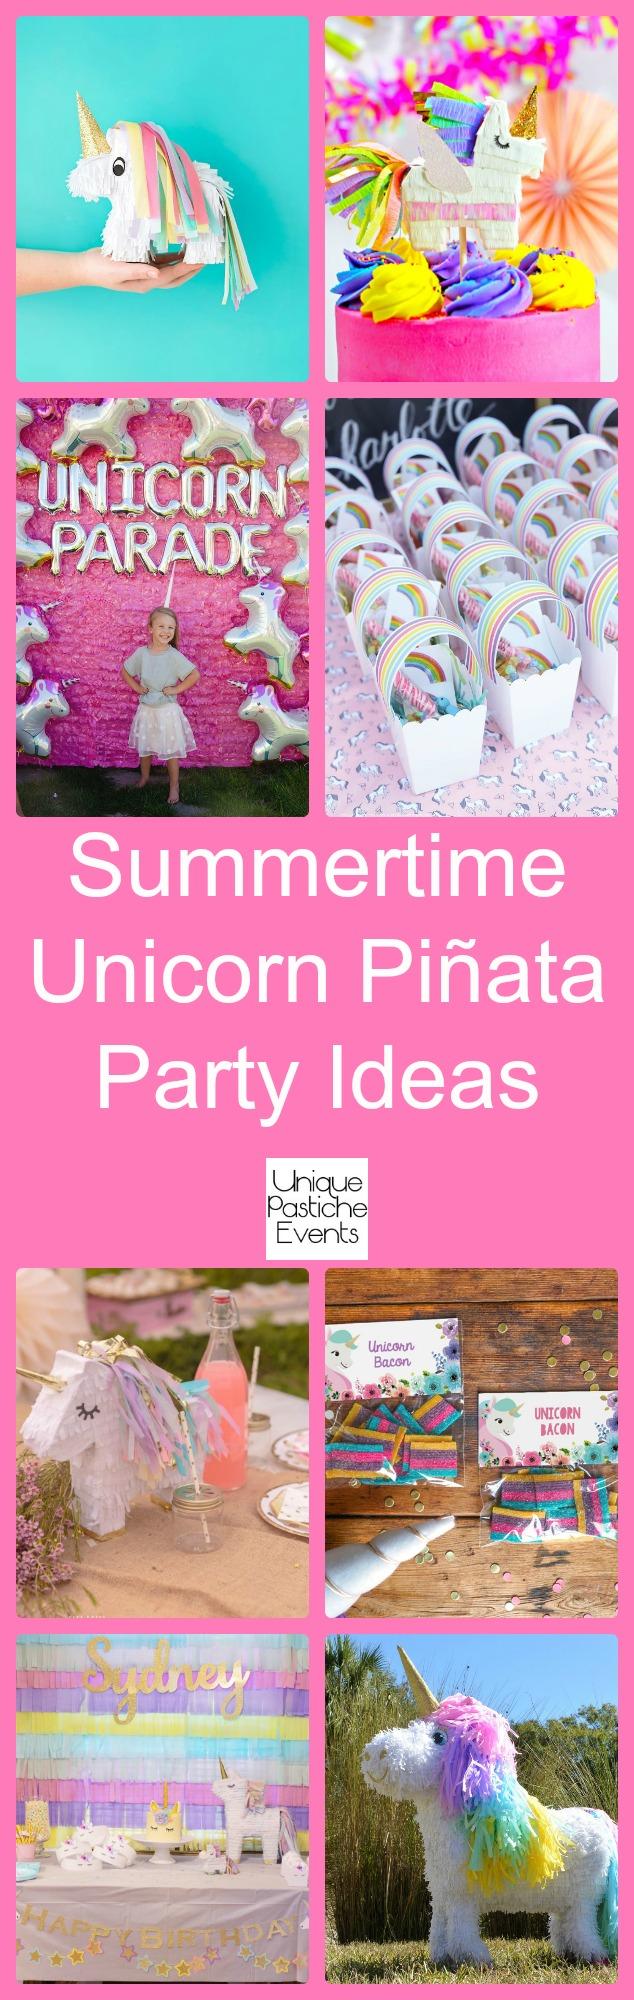 Summertime Unicorn Piñata Party